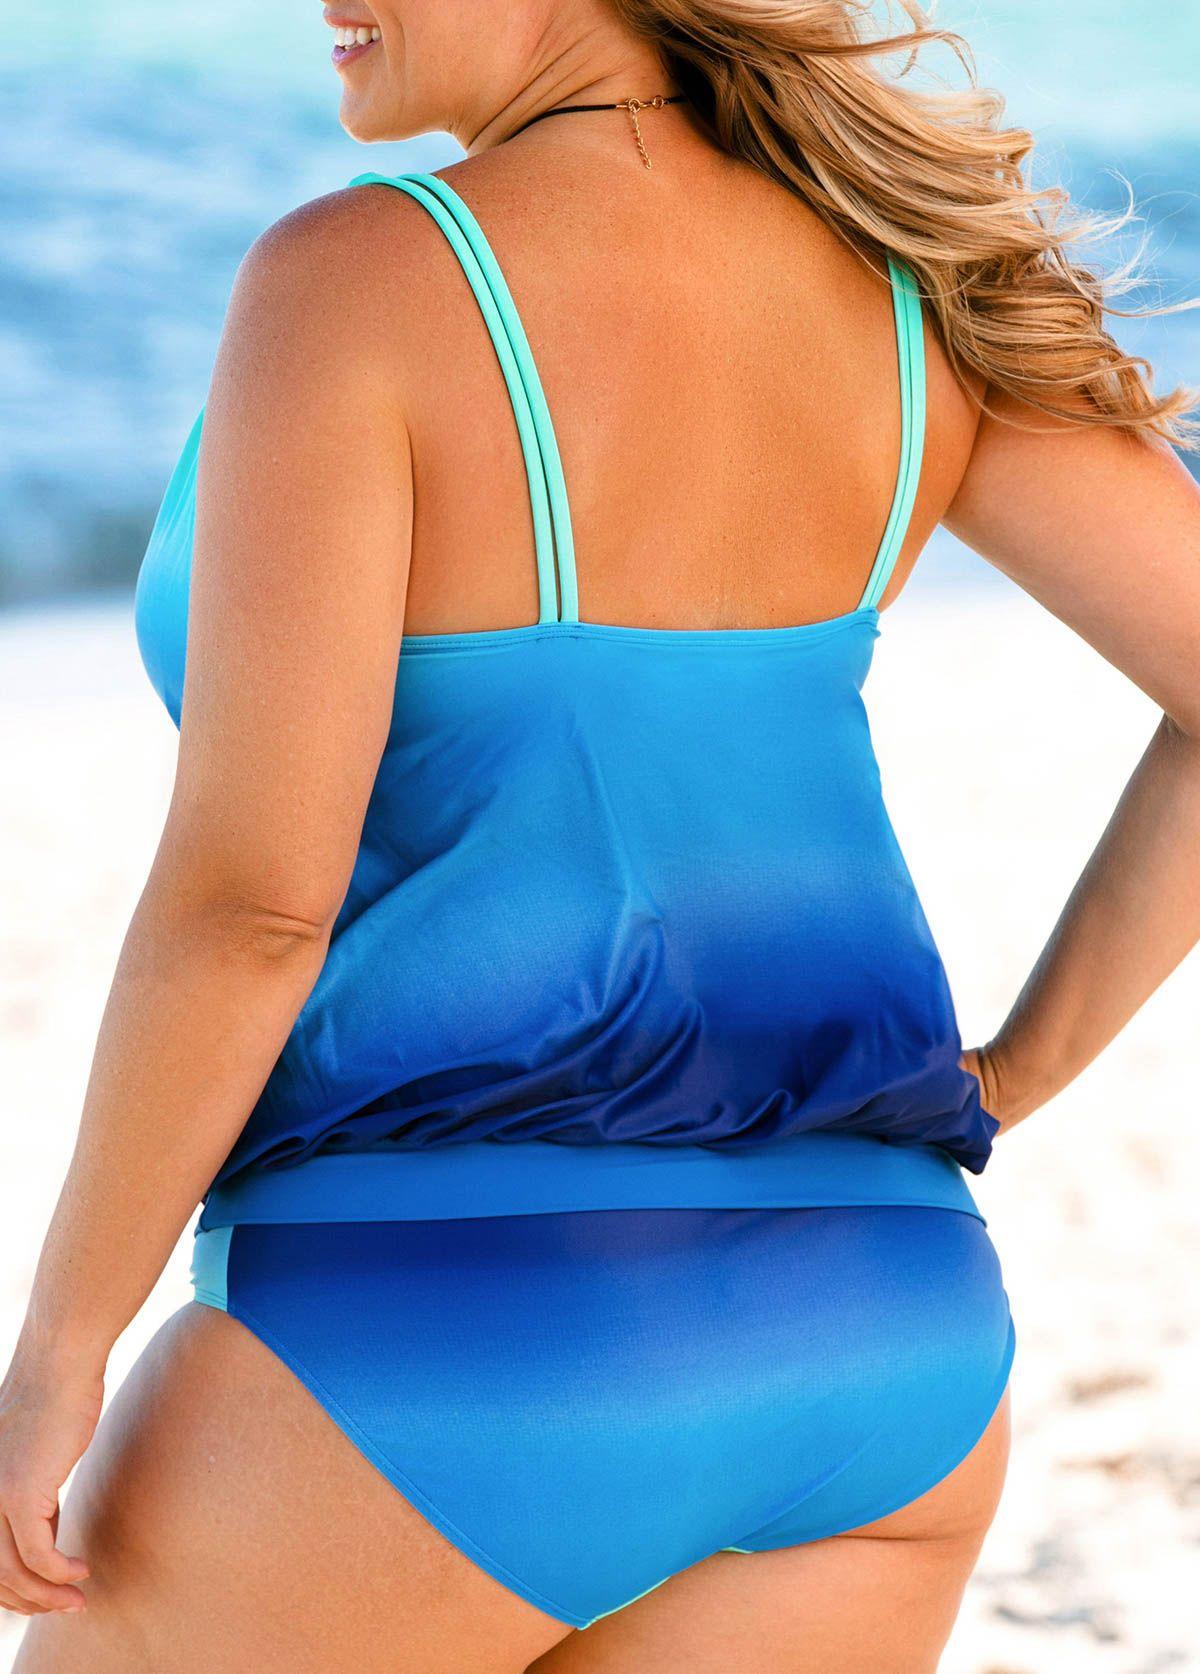 37b7031530020 Plus Size Open Back Gradient Tankini Set | Rosewe.com - USD $34.48 ...